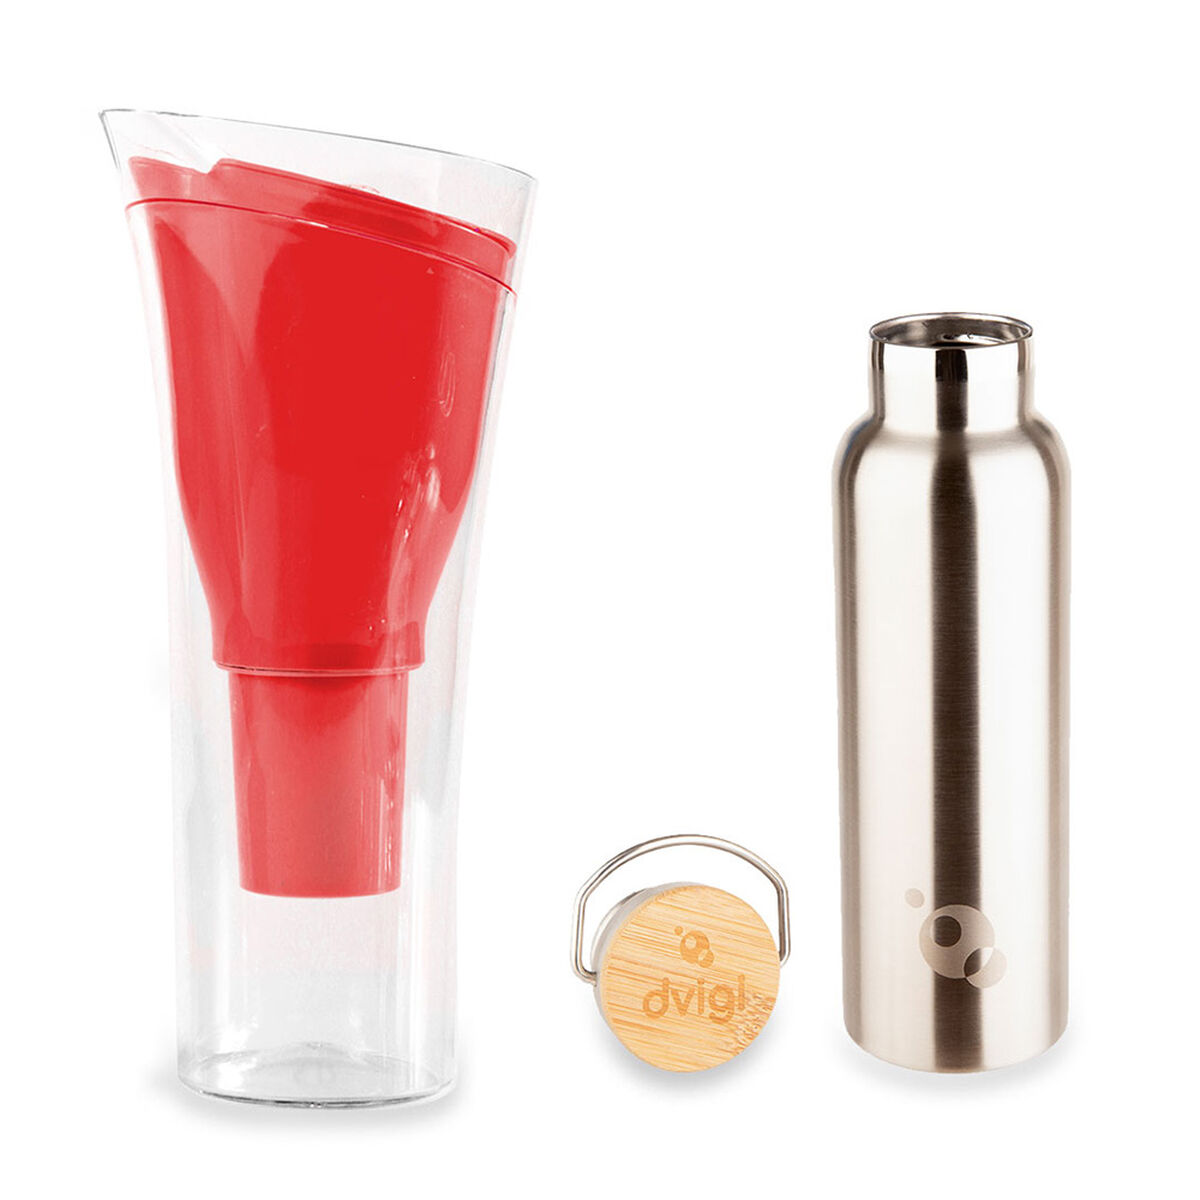 Jarro Purificador de Agua + Botella Benjamina Dvigi Rojo